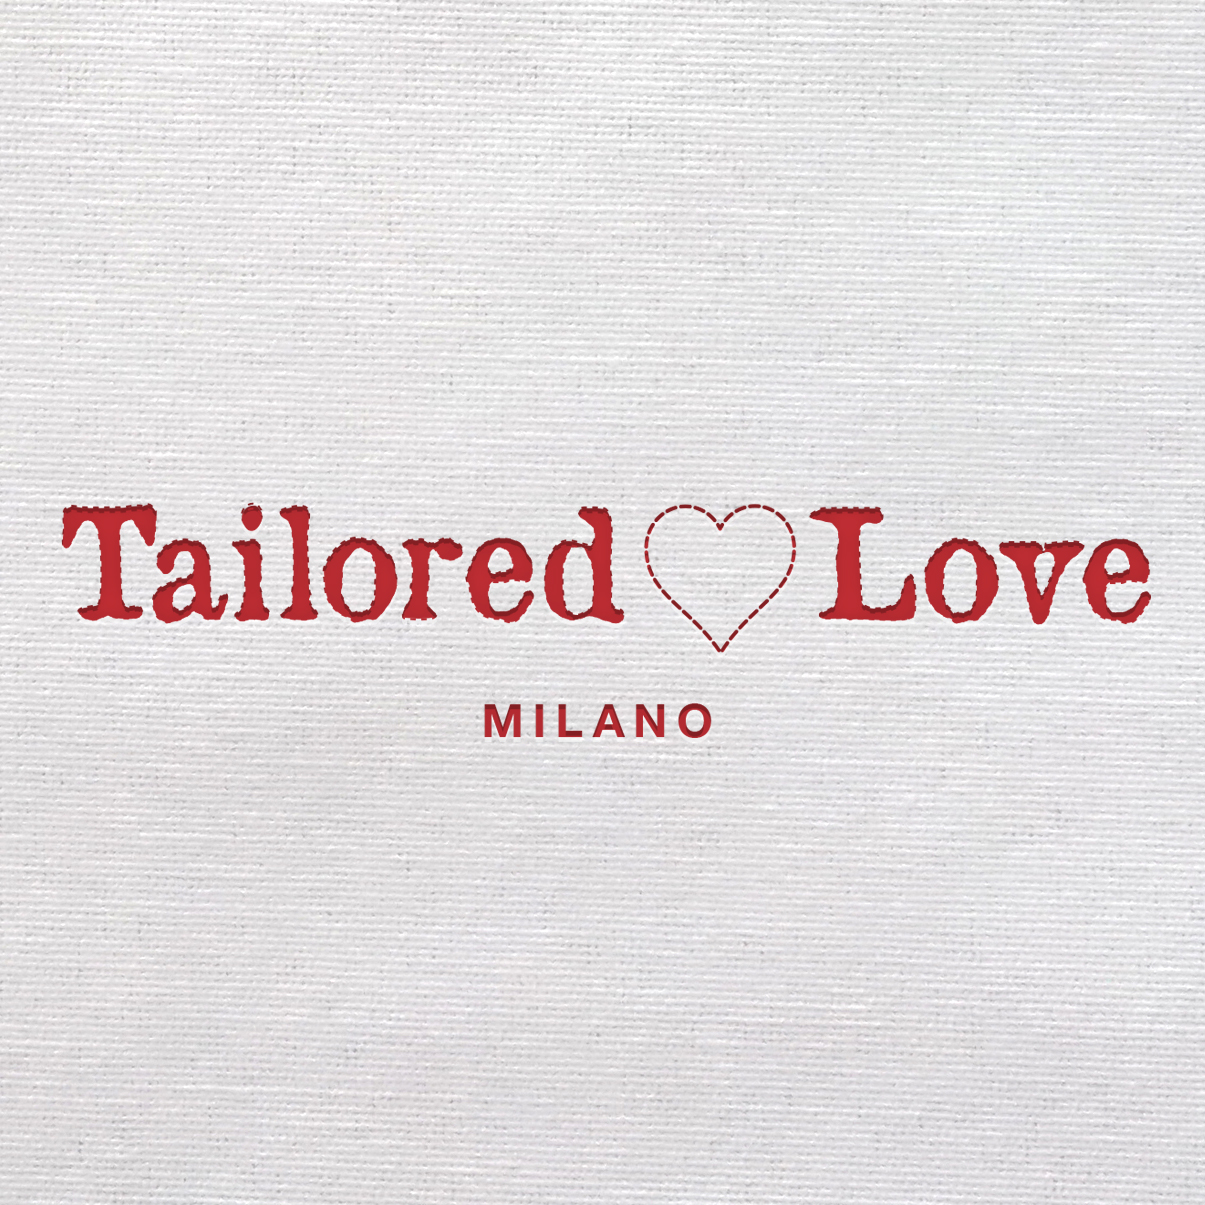 """Tailored Love"" - Logo (Clothing Company)"